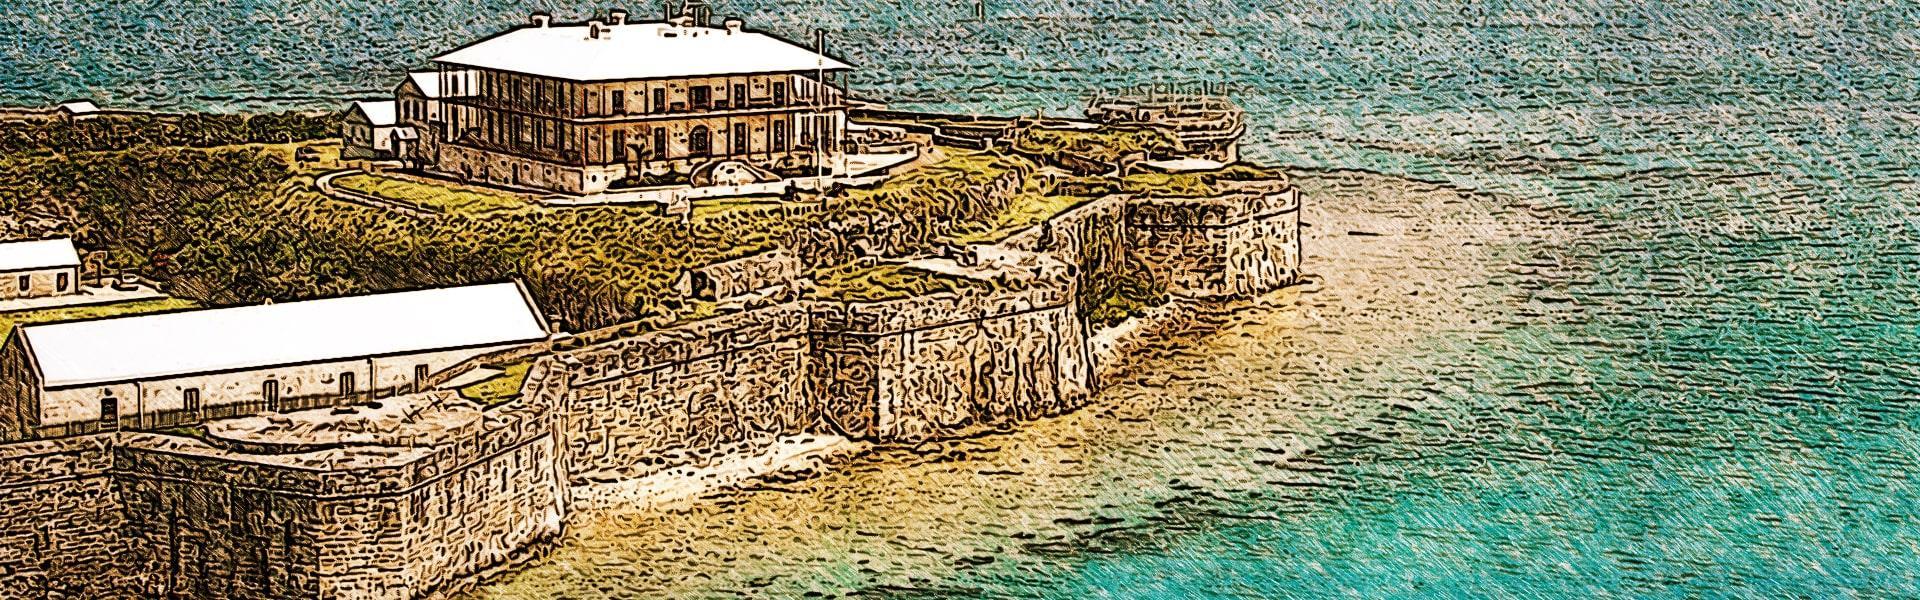 Bermuda-min